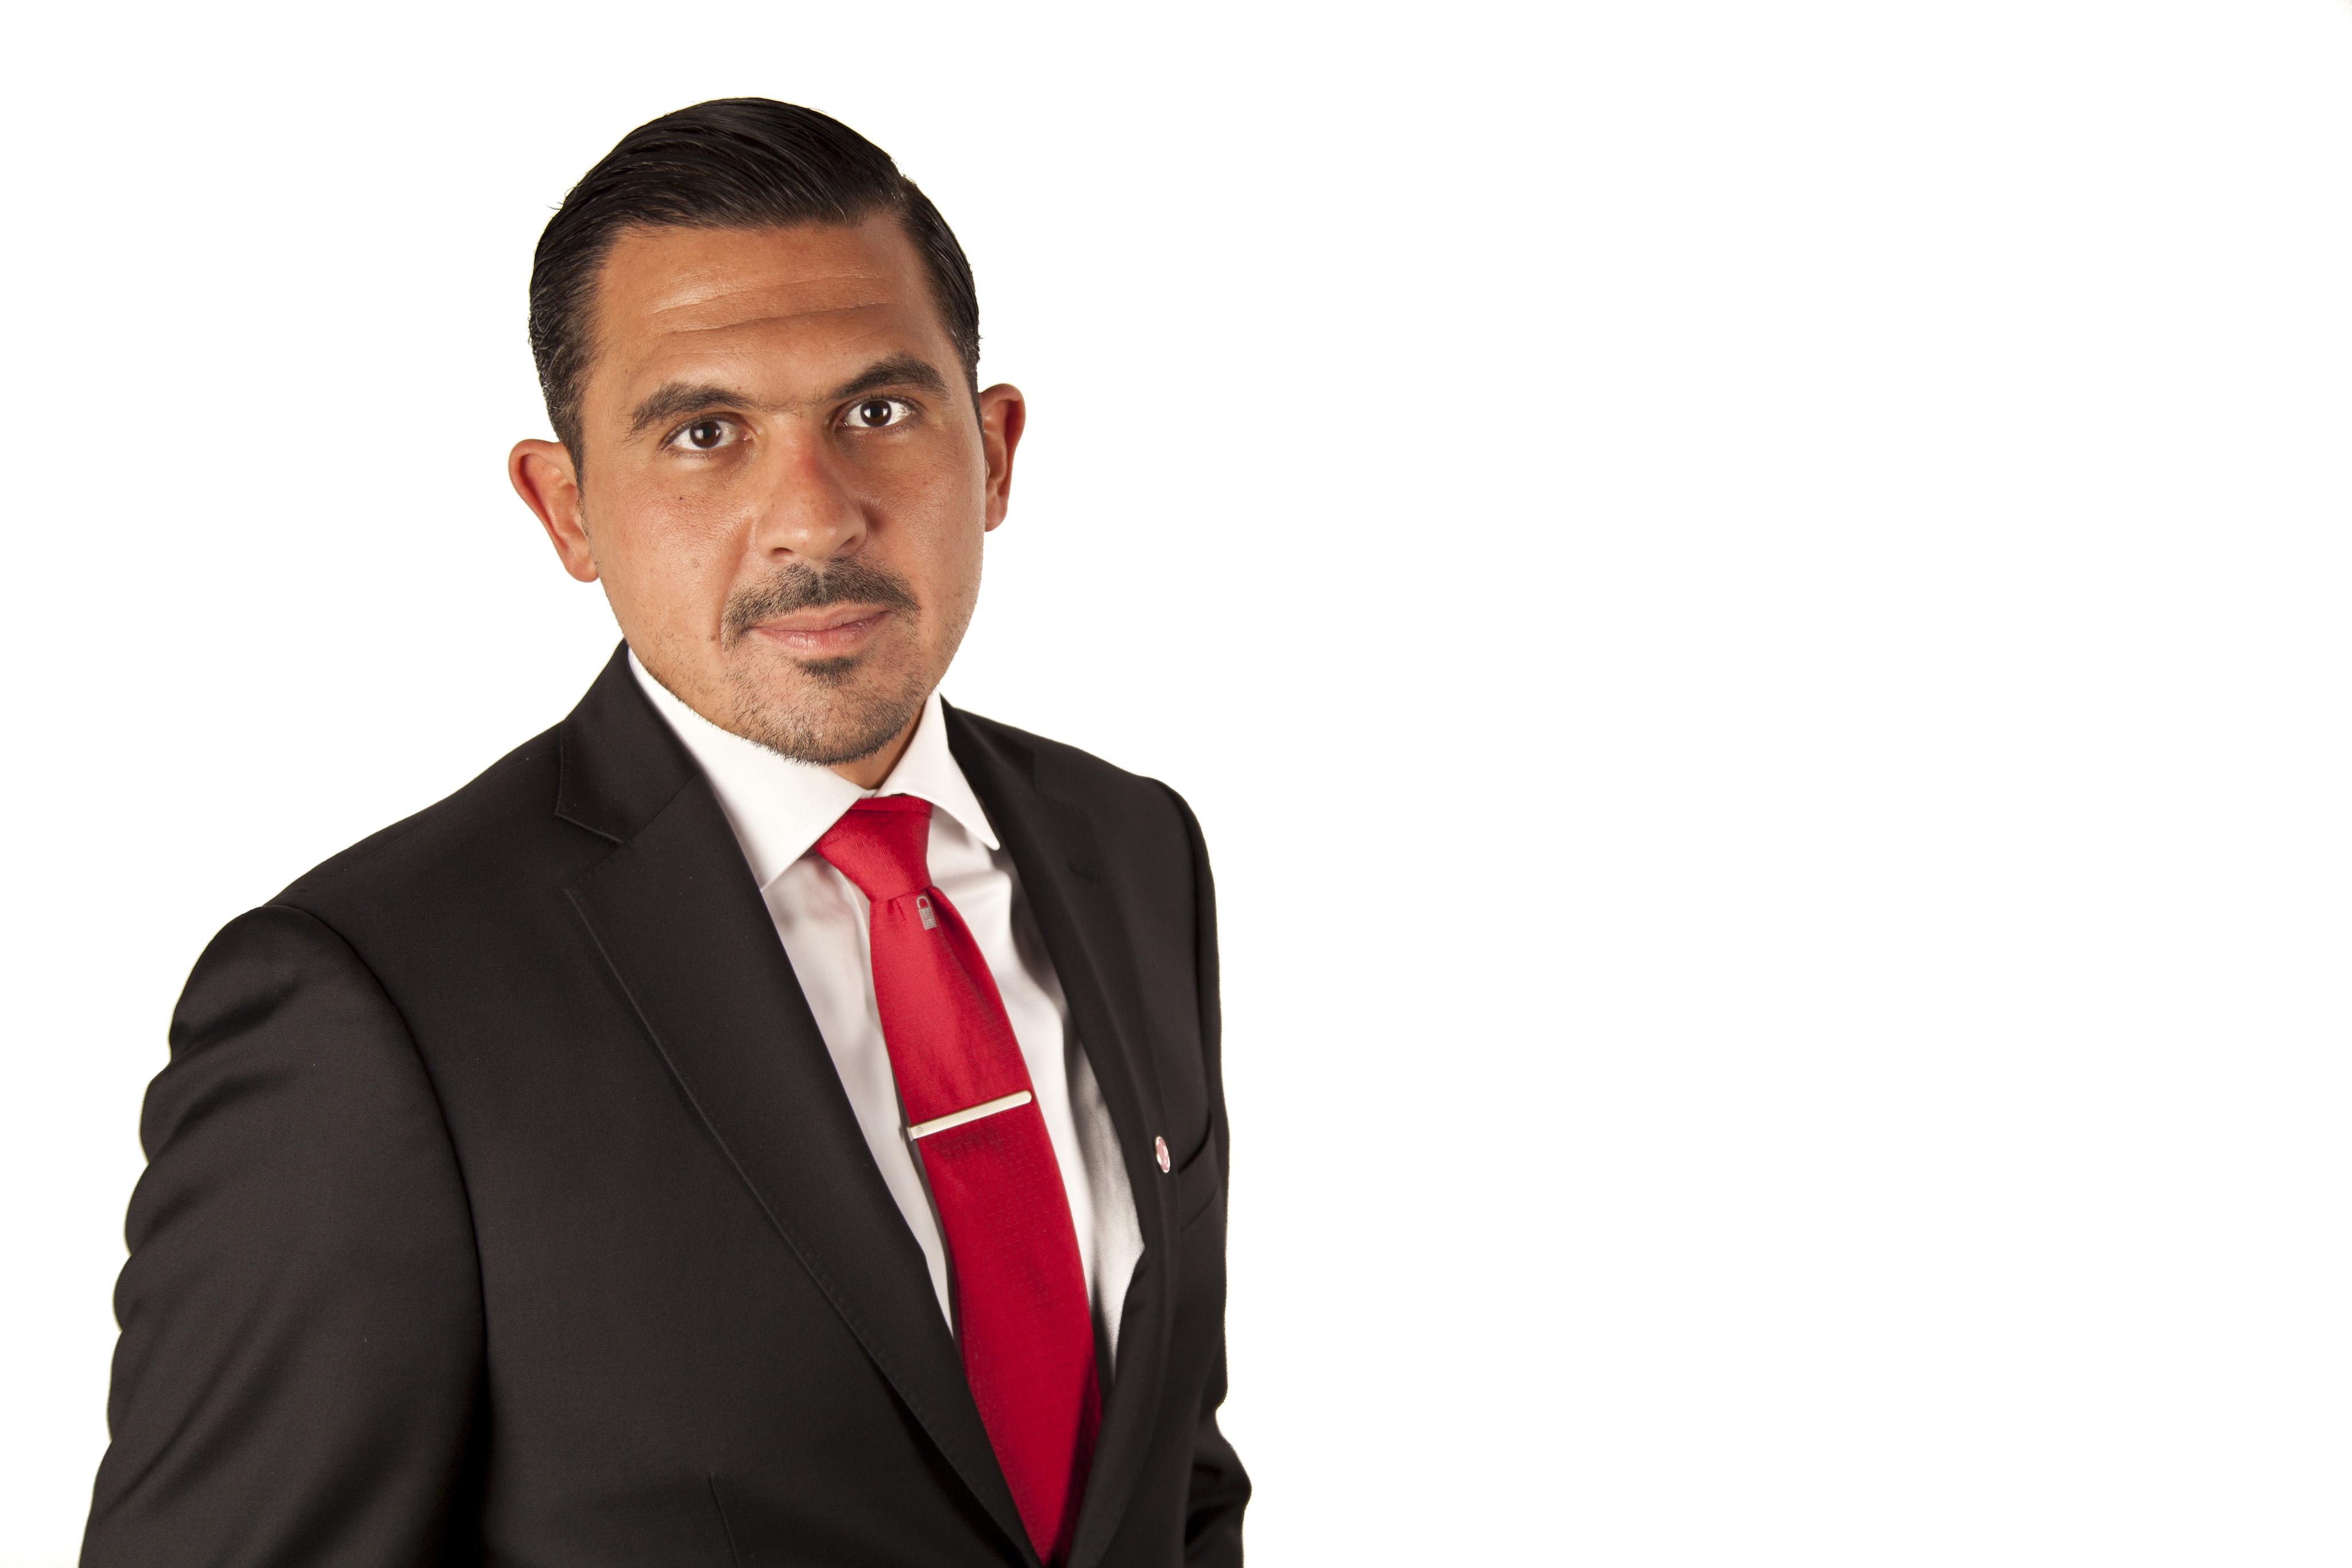 new-vice-chairman-of-prca-mena-announced